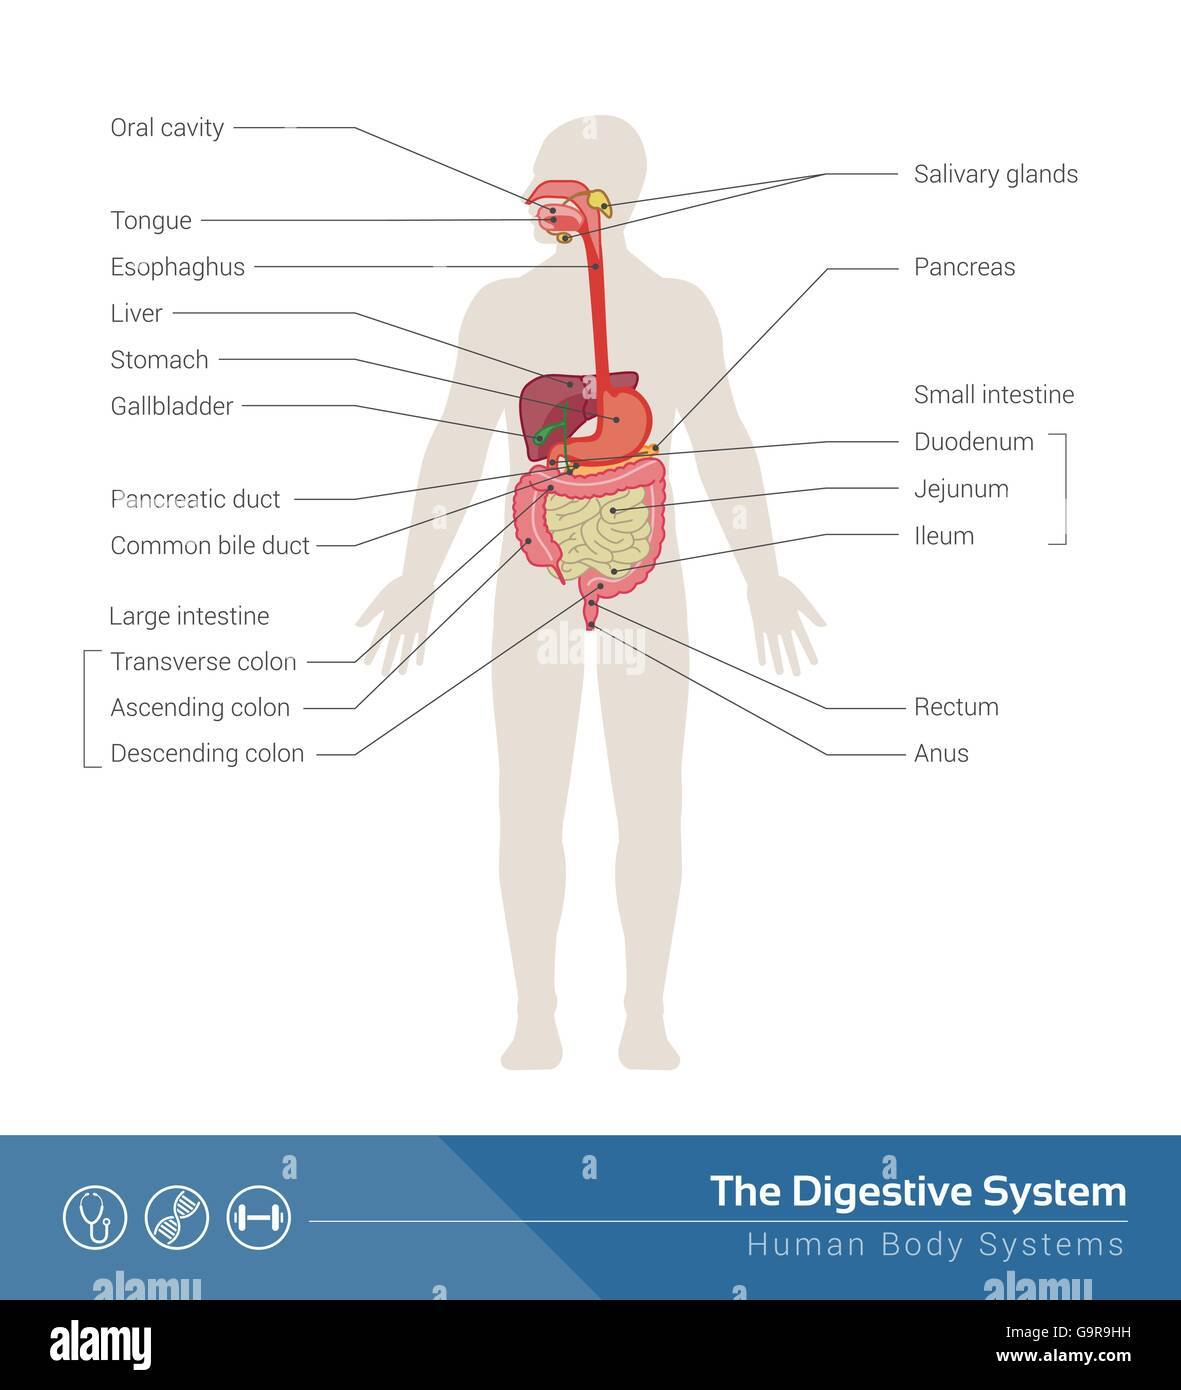 Digestive System Stockfotos & Digestive System Bilder - Alamy